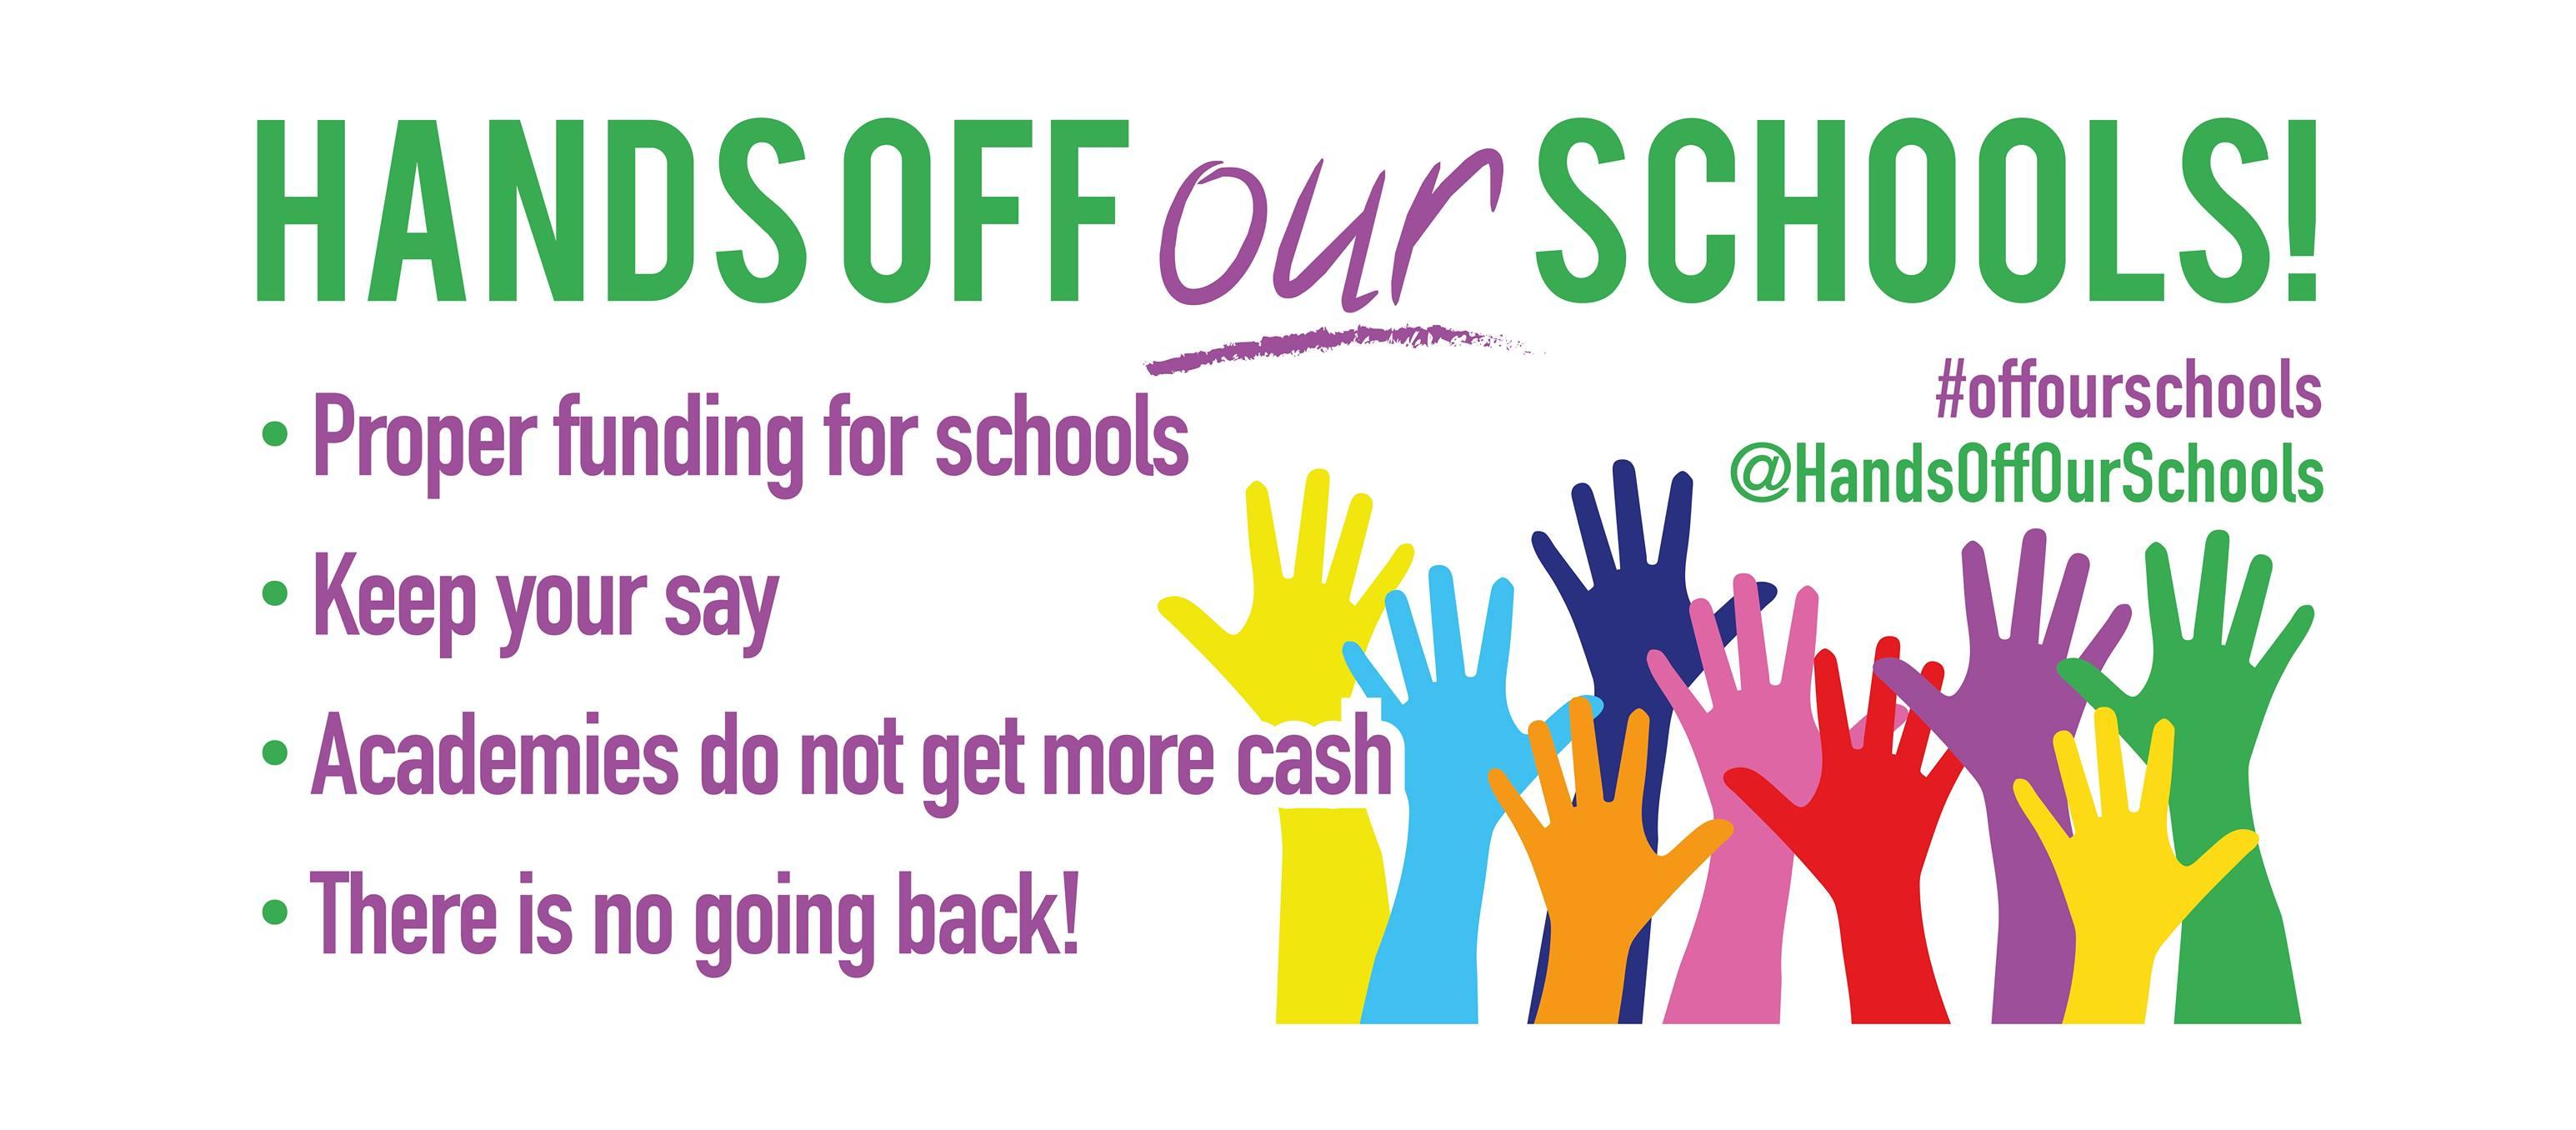 Hands_off_our_schools